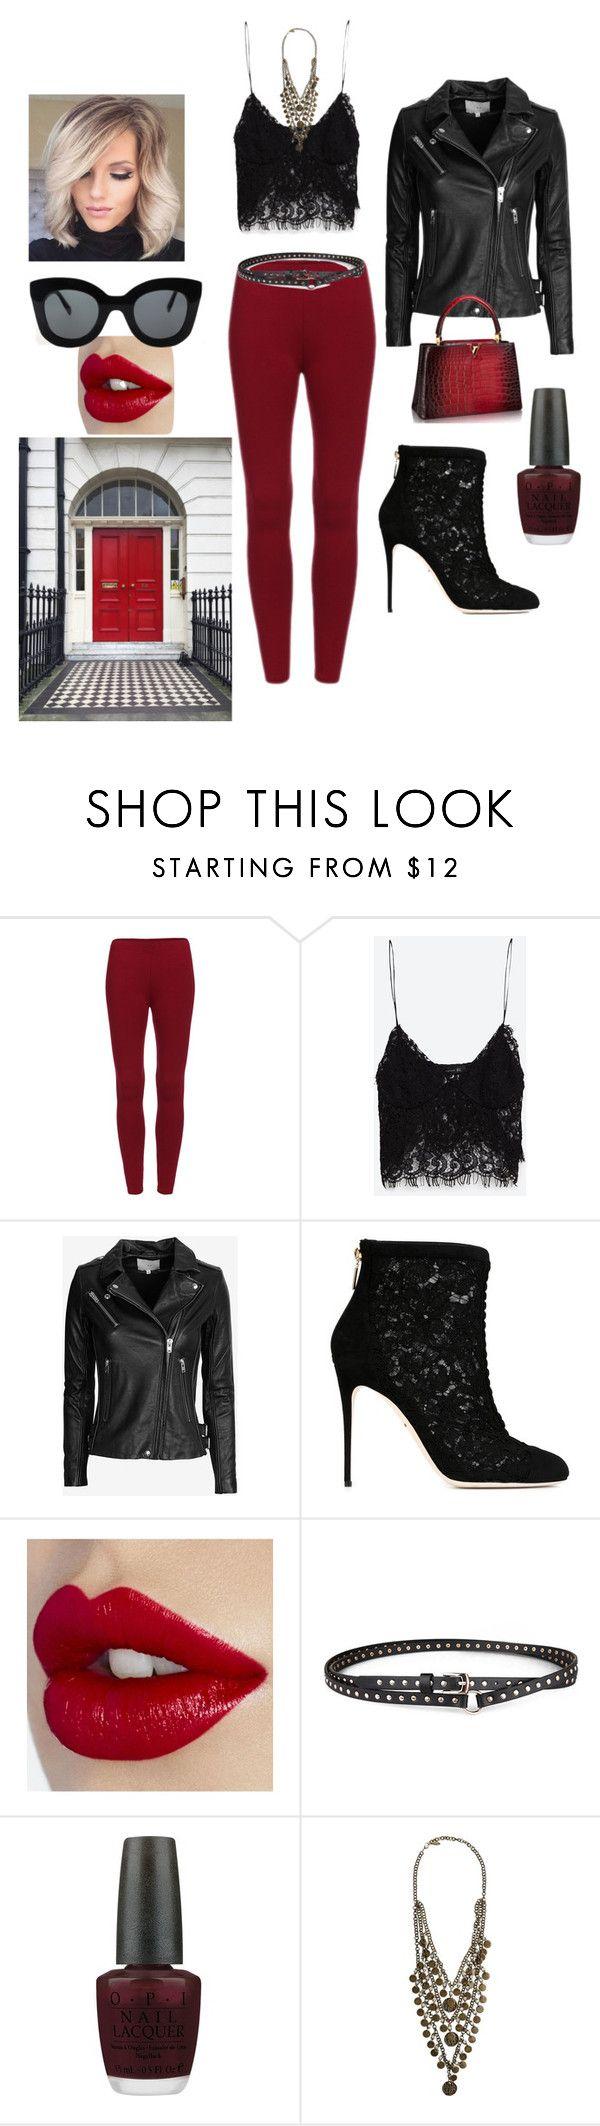 """thor"" by mrs-hakes ❤ liked on Polyvore featuring Zara, IRO, Dolce&Gabbana, Chicnova Fashion, OPI, Ettika, CÉLINE, women's clothing, women and female"